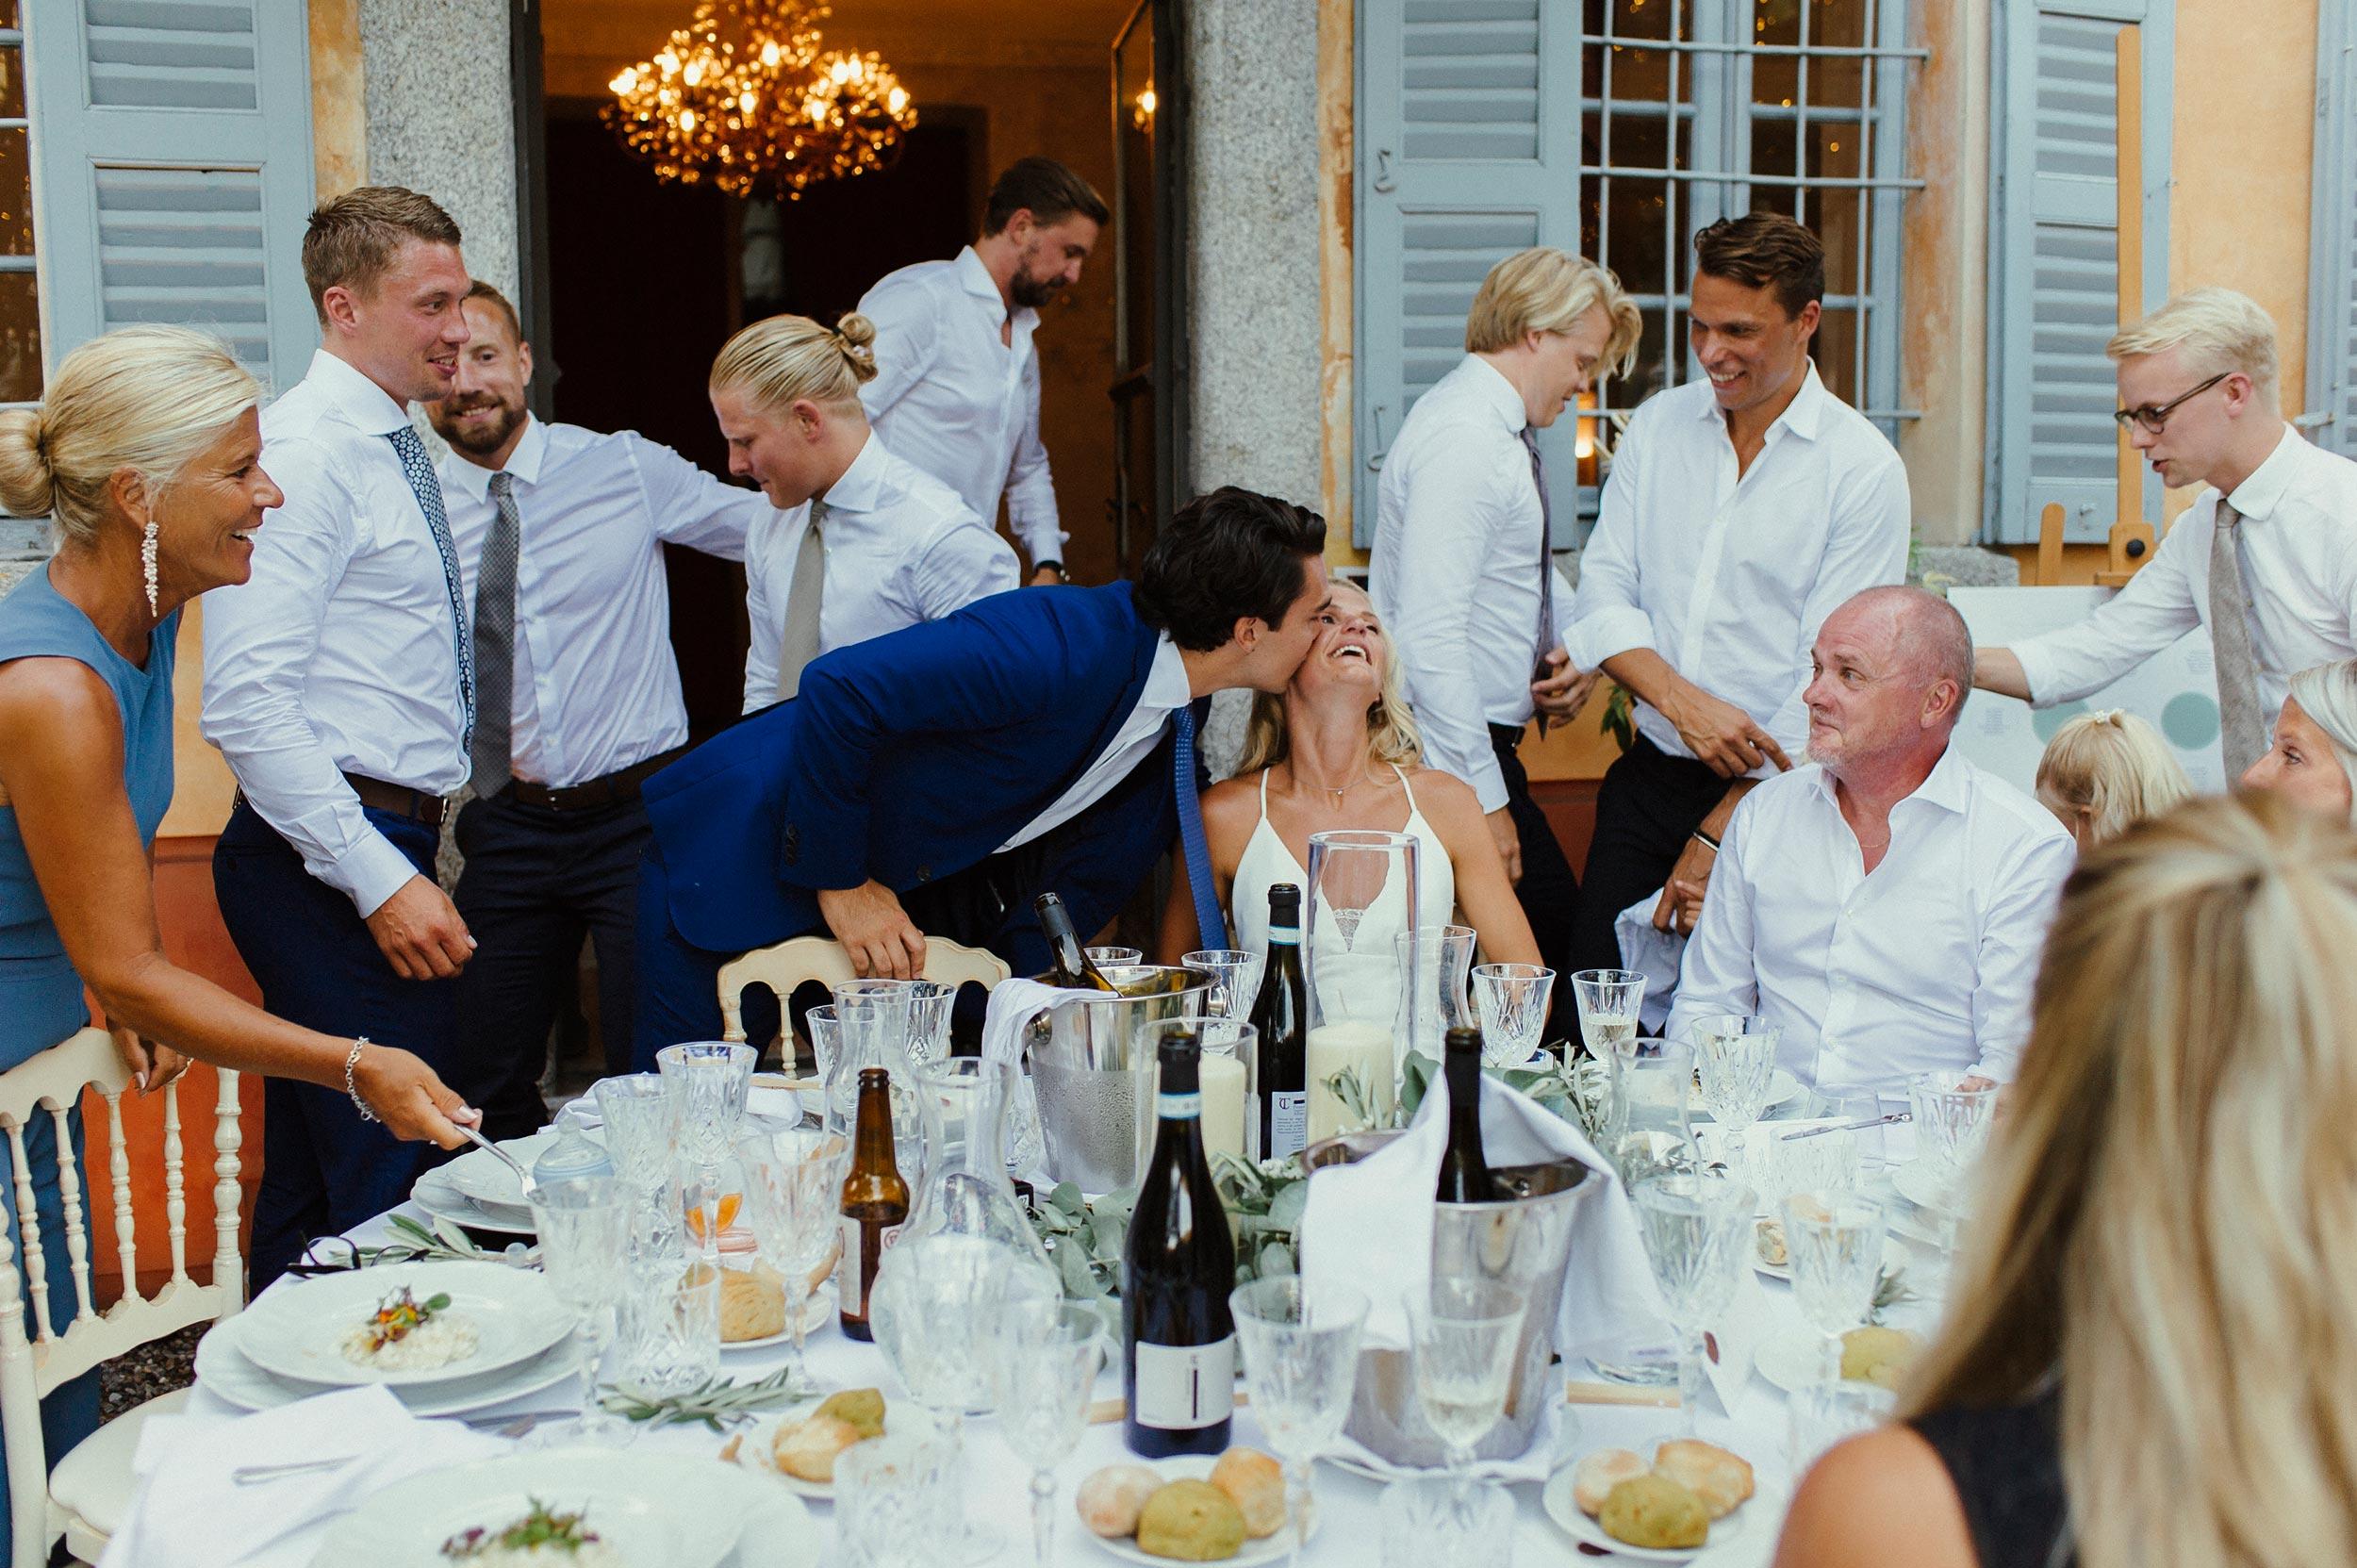 2018-Villa-Regina-Teodolinda-Lake-Como-Wedding-Photographer-Italy-Alessandro-Avenali-278.jpg